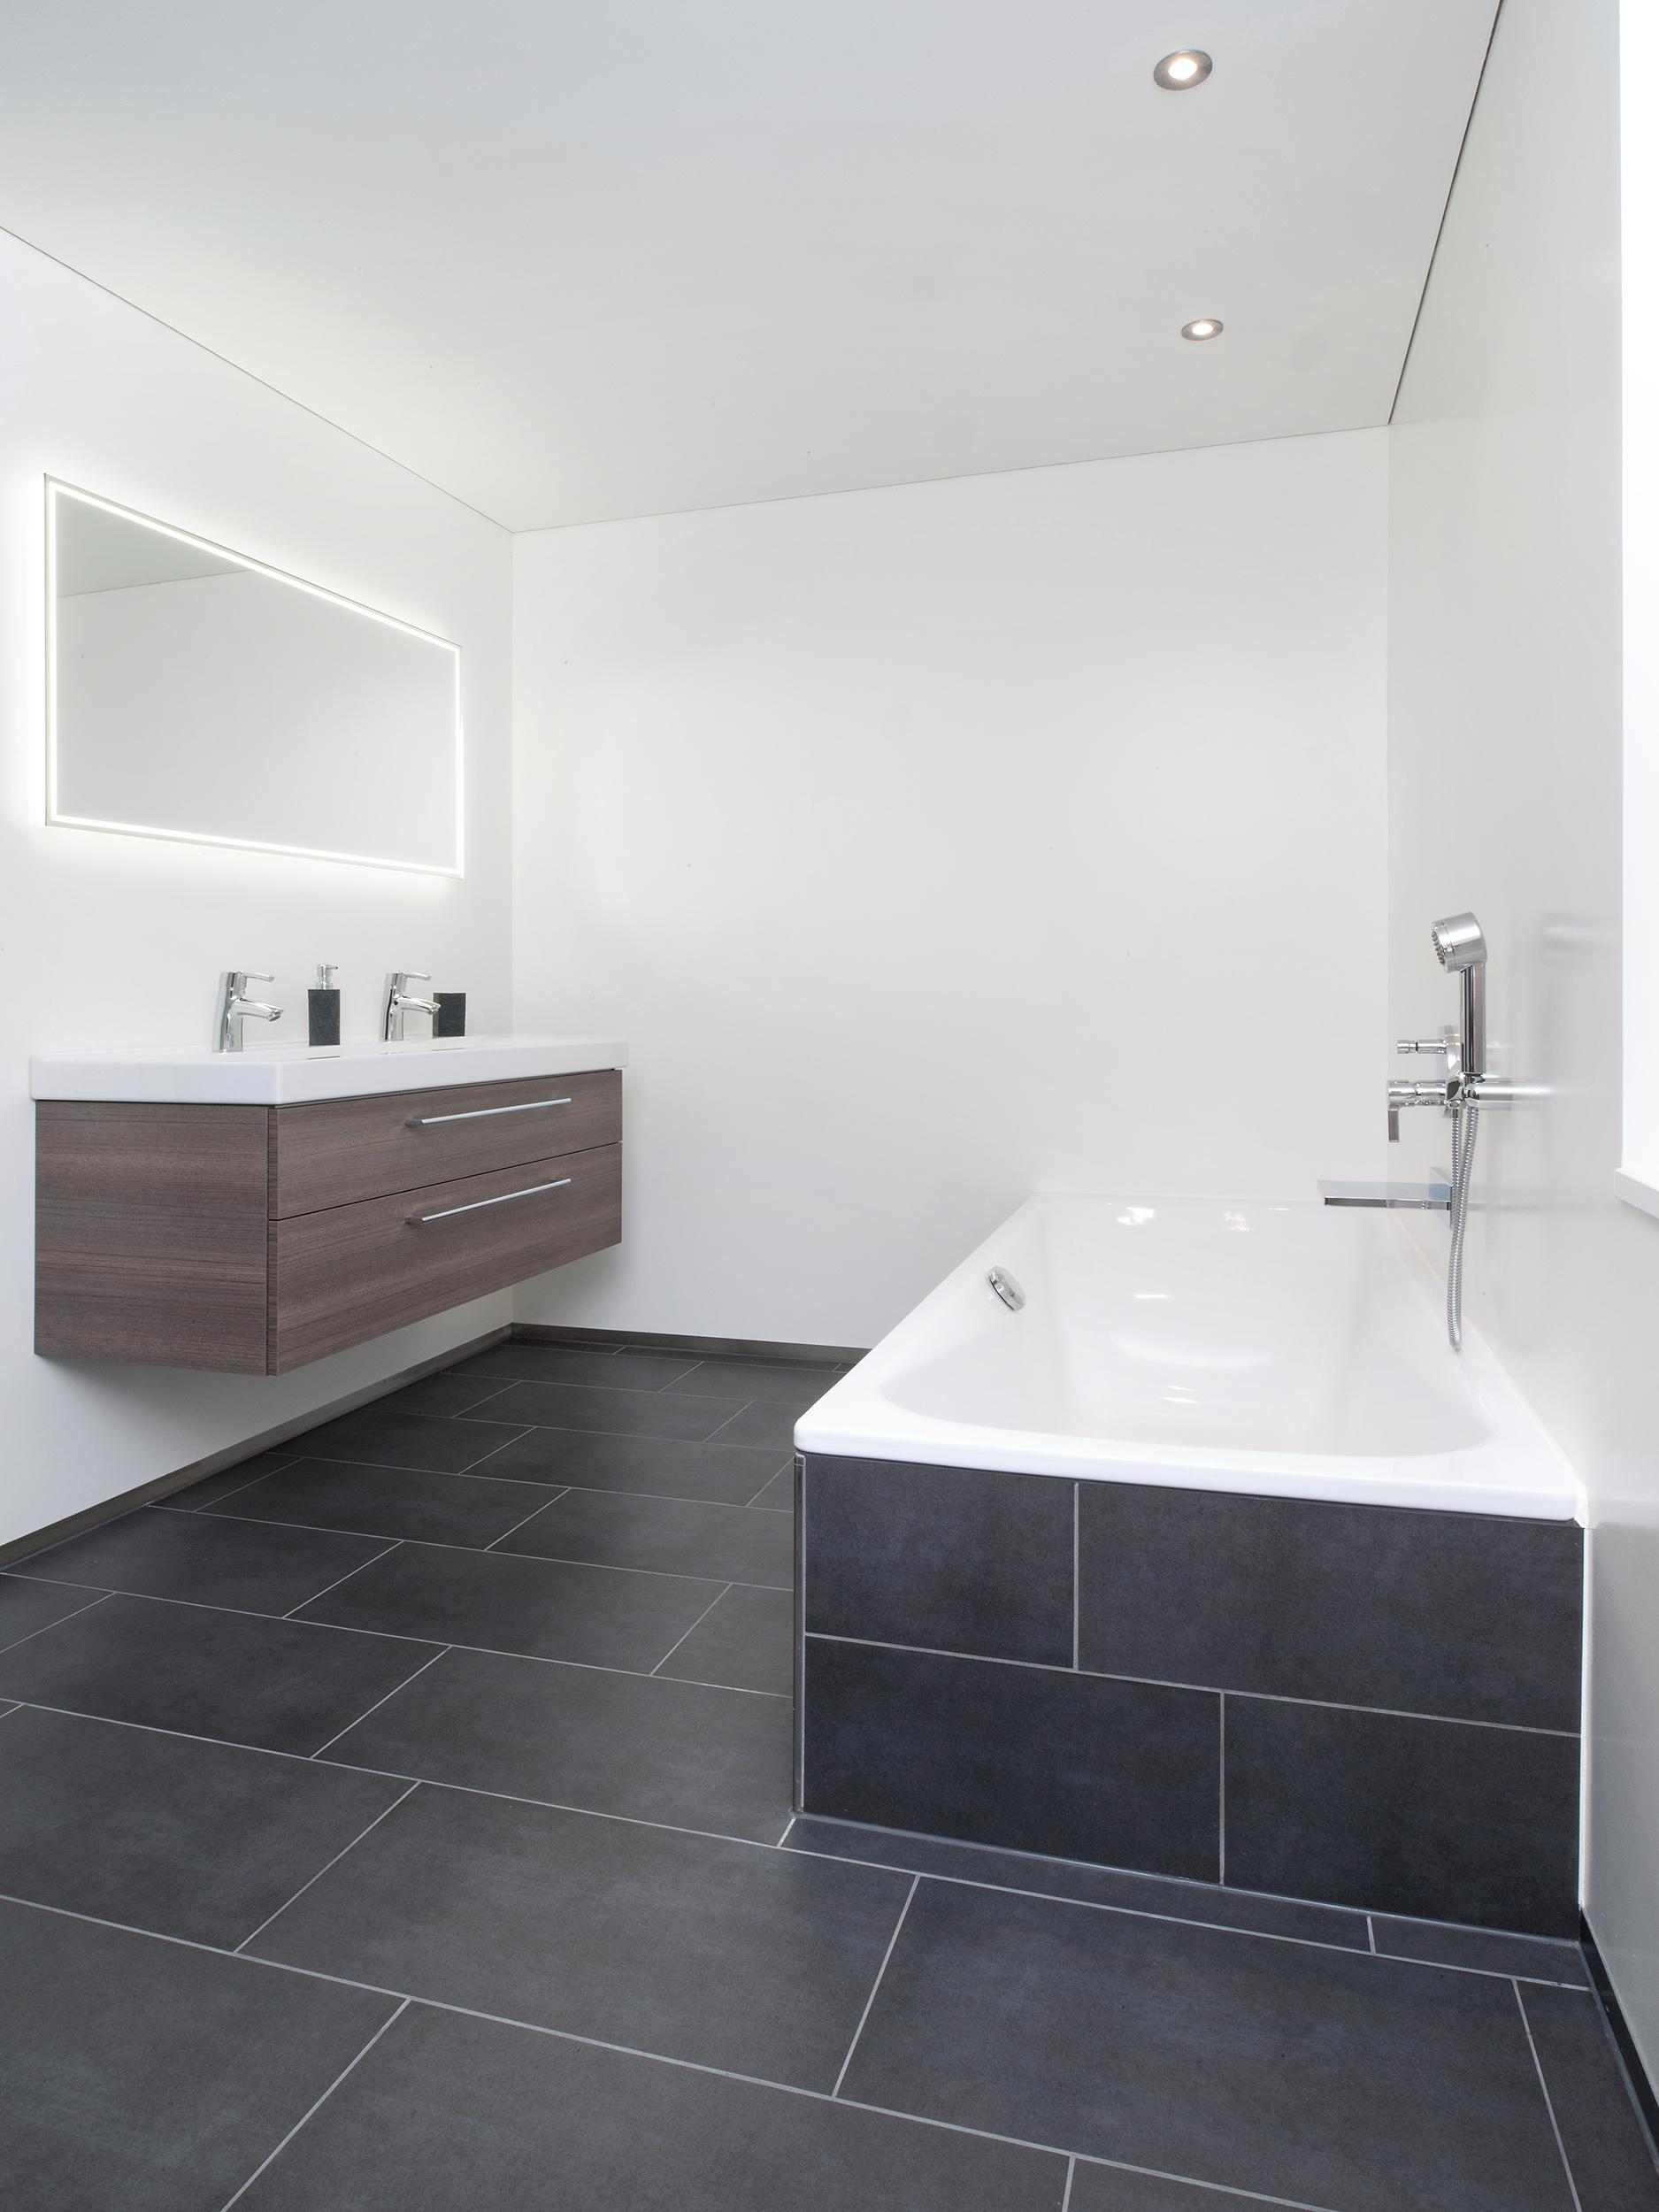 Einfamilienhaus in gossau keramik bau ag for Badezimmer platten